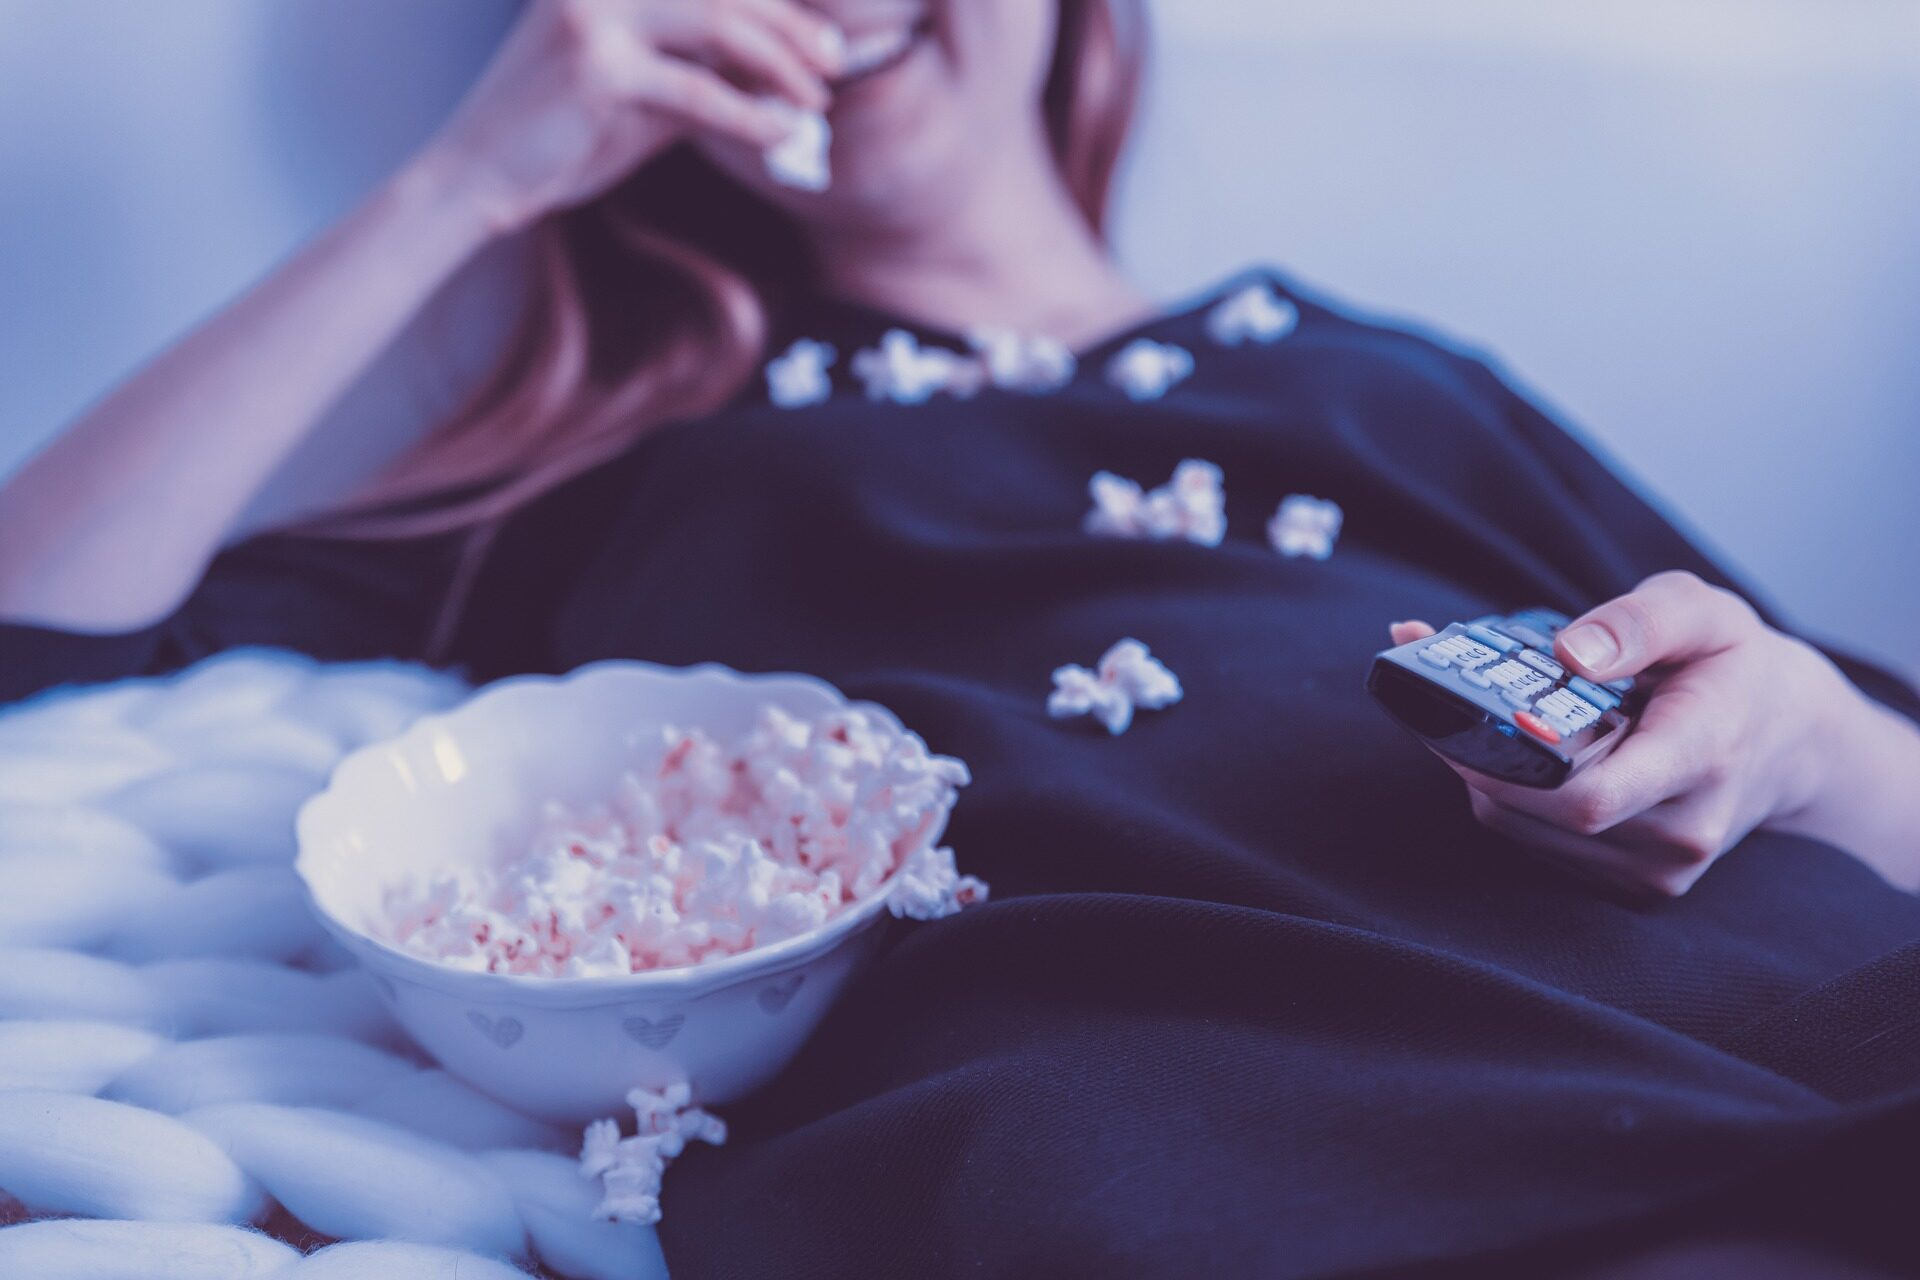 кино попкорн телевизор